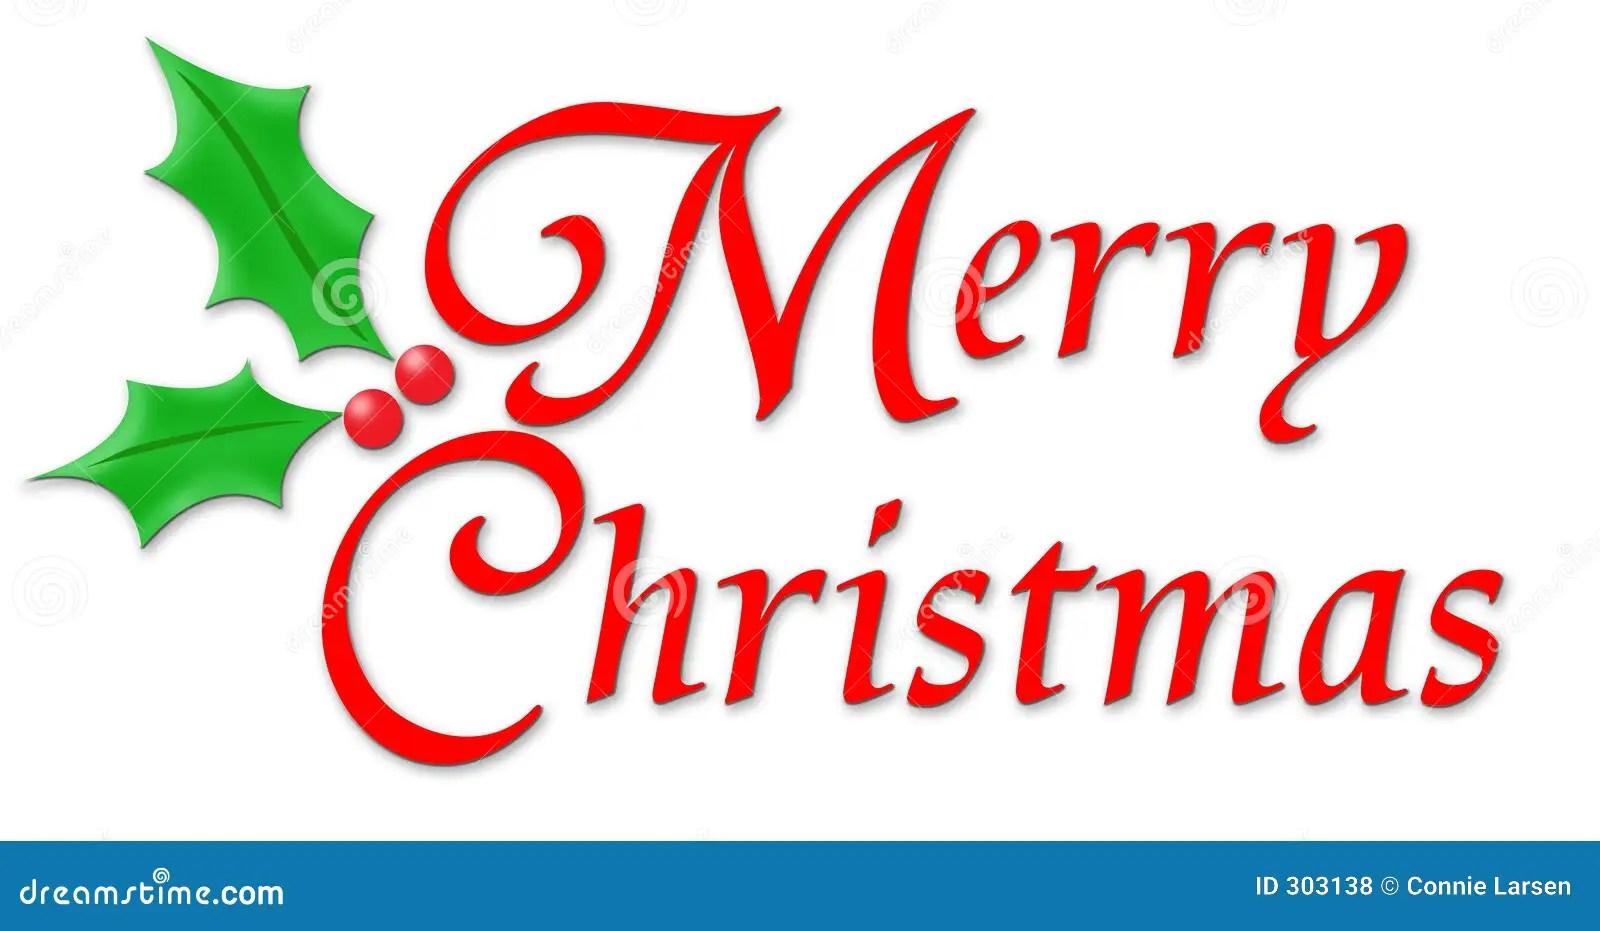 merrychristmas303138.jpg (1300×774) Merry christmas